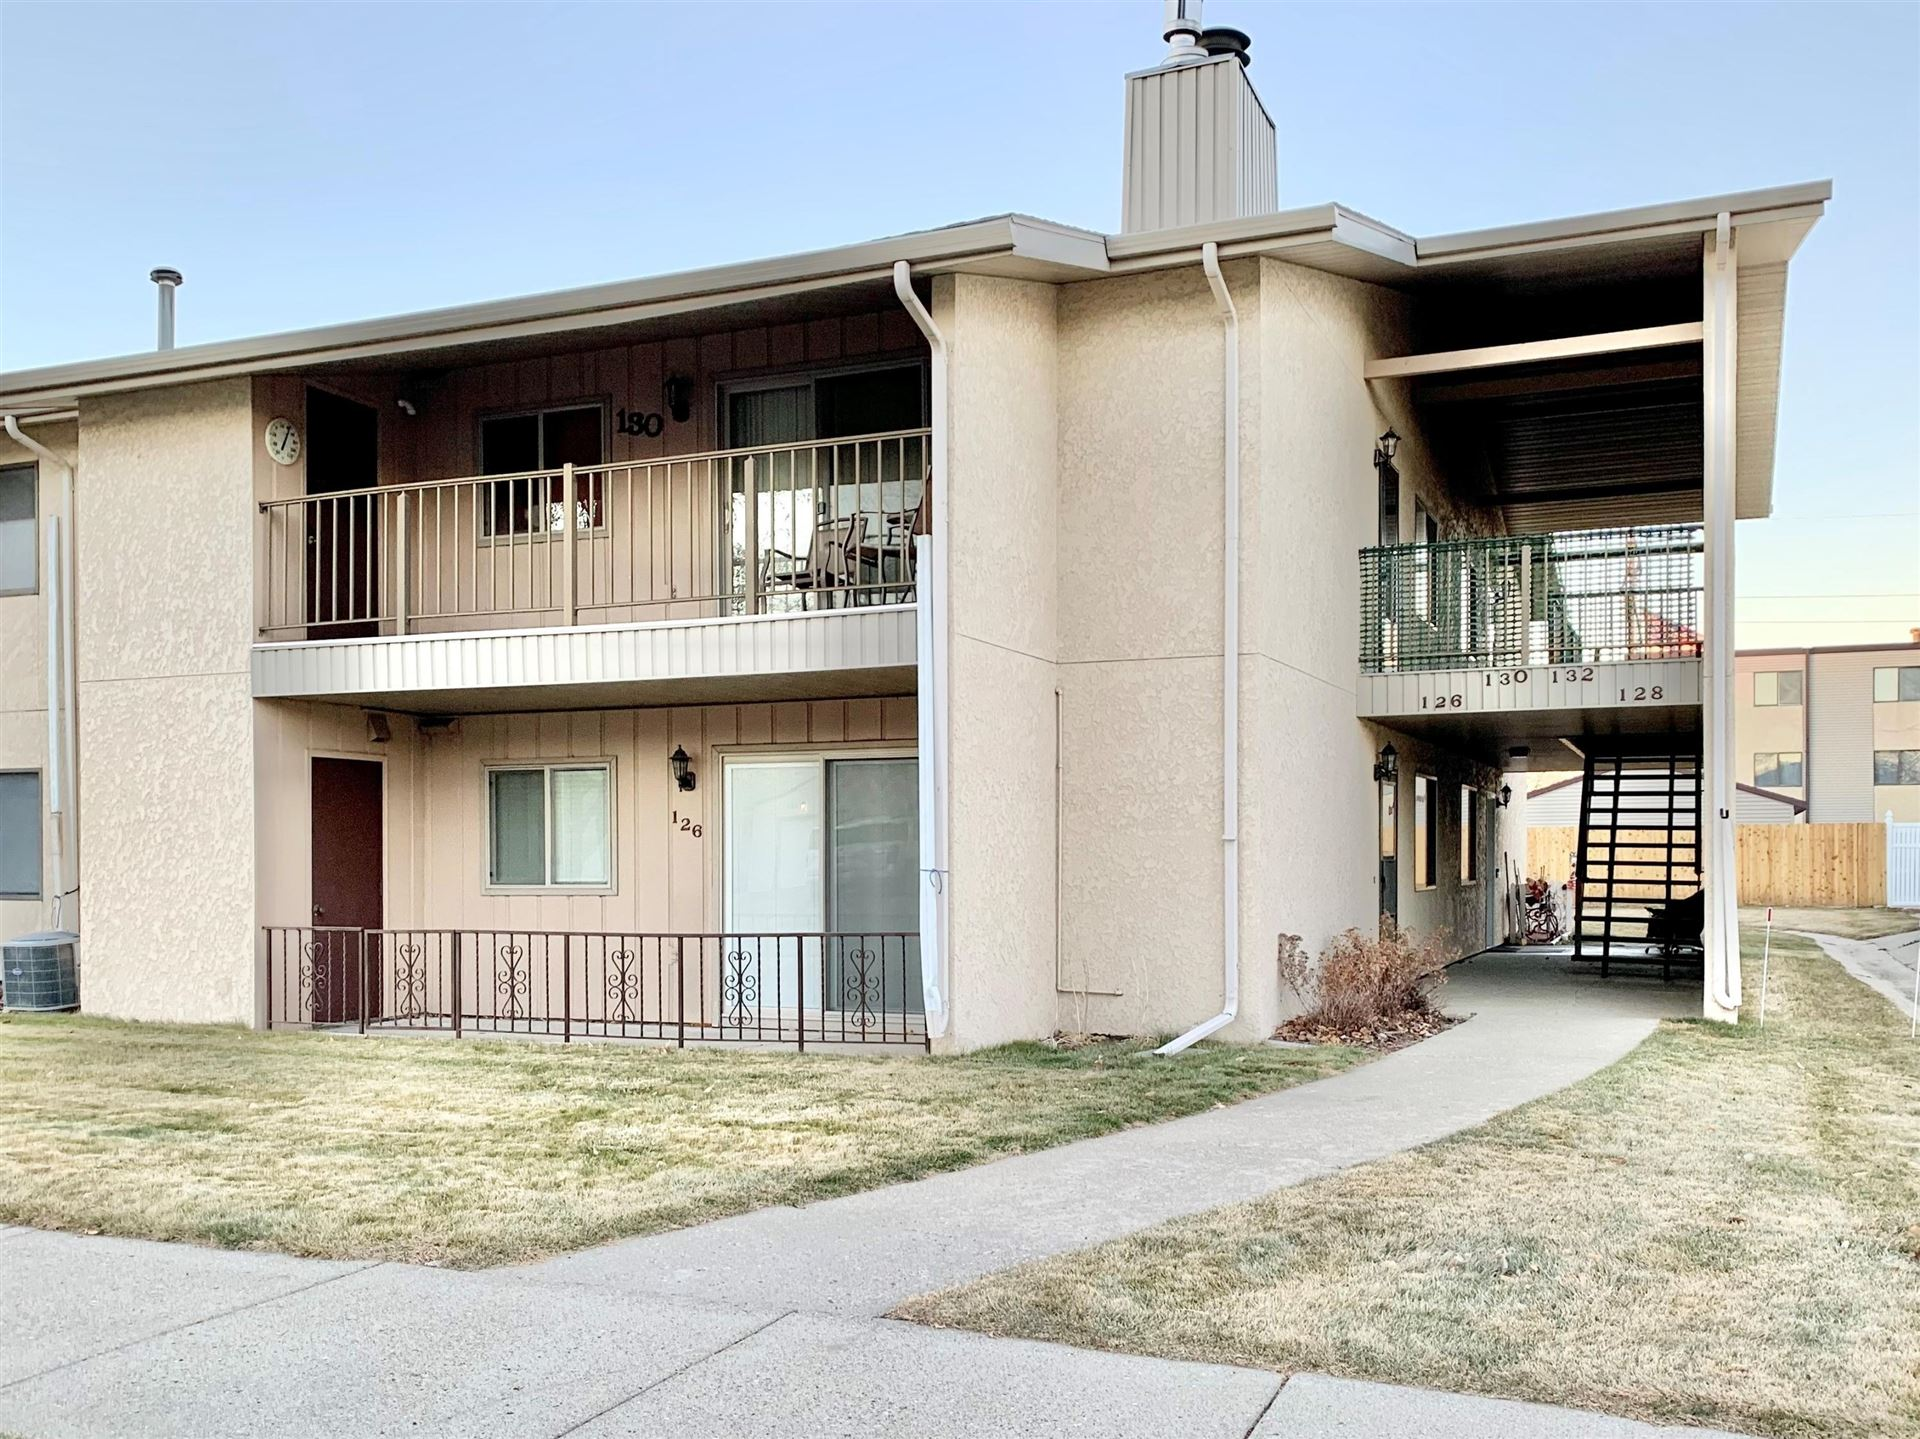 126 Boise Avenue, Bismarck, ND 58504 - #: 409116